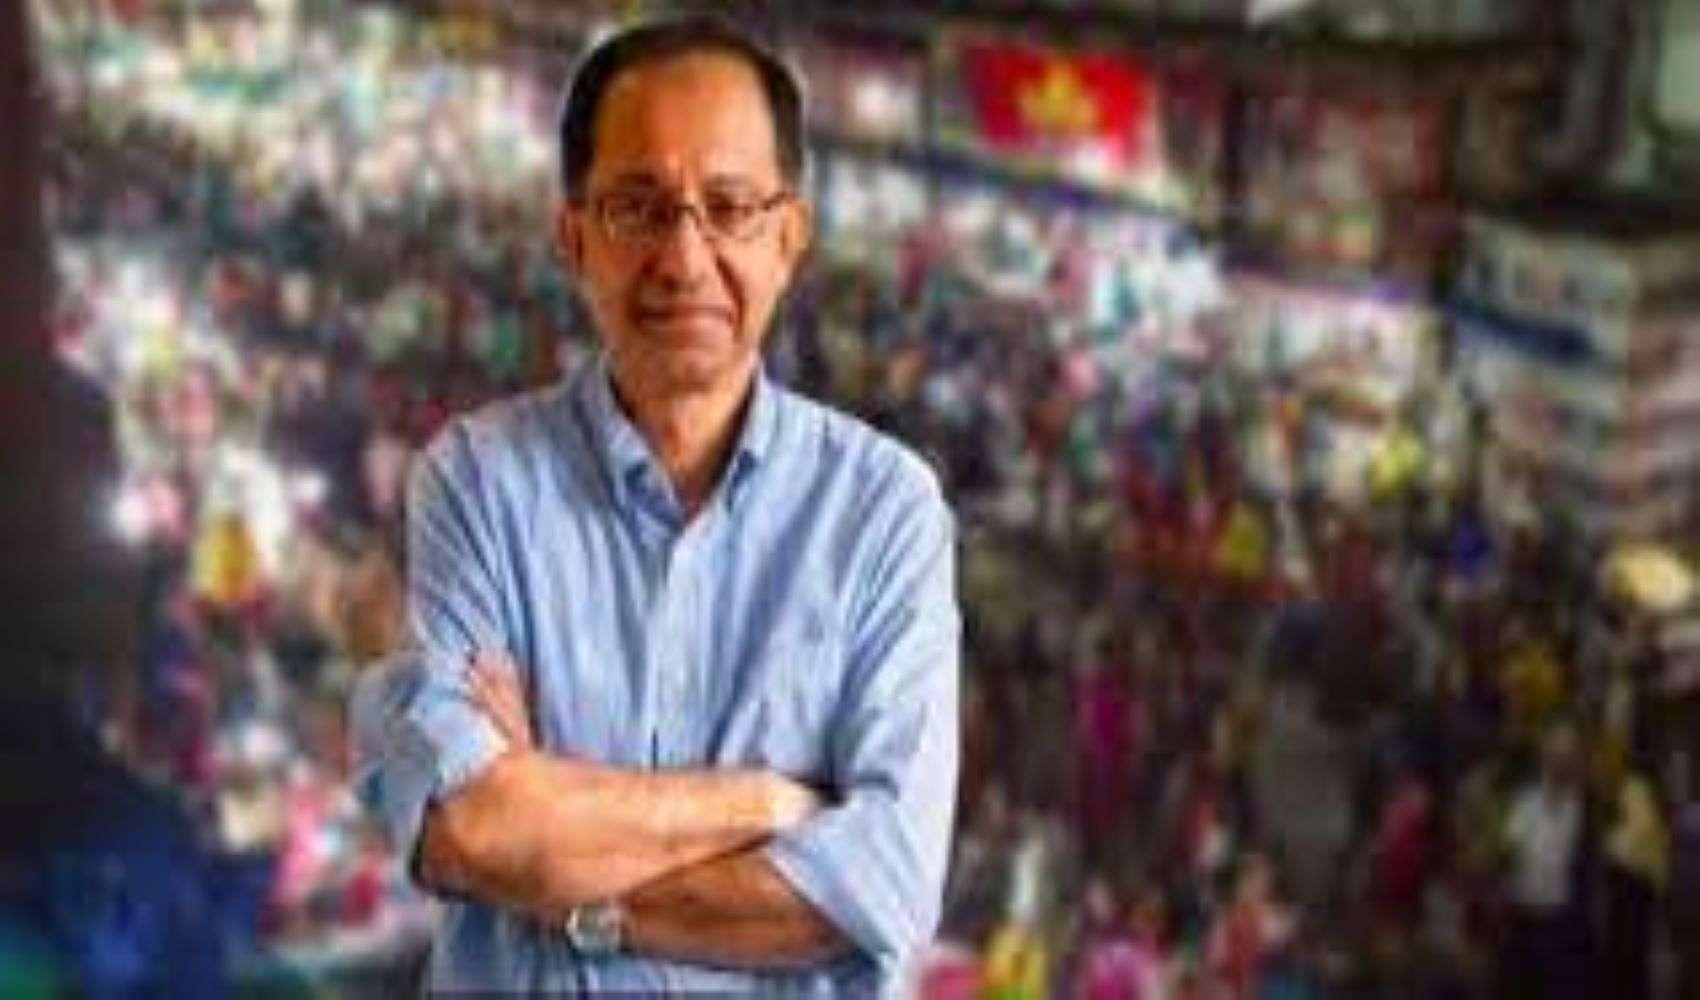 Kaushik Basu, an Indian economist receives prestigious Humboldt research award